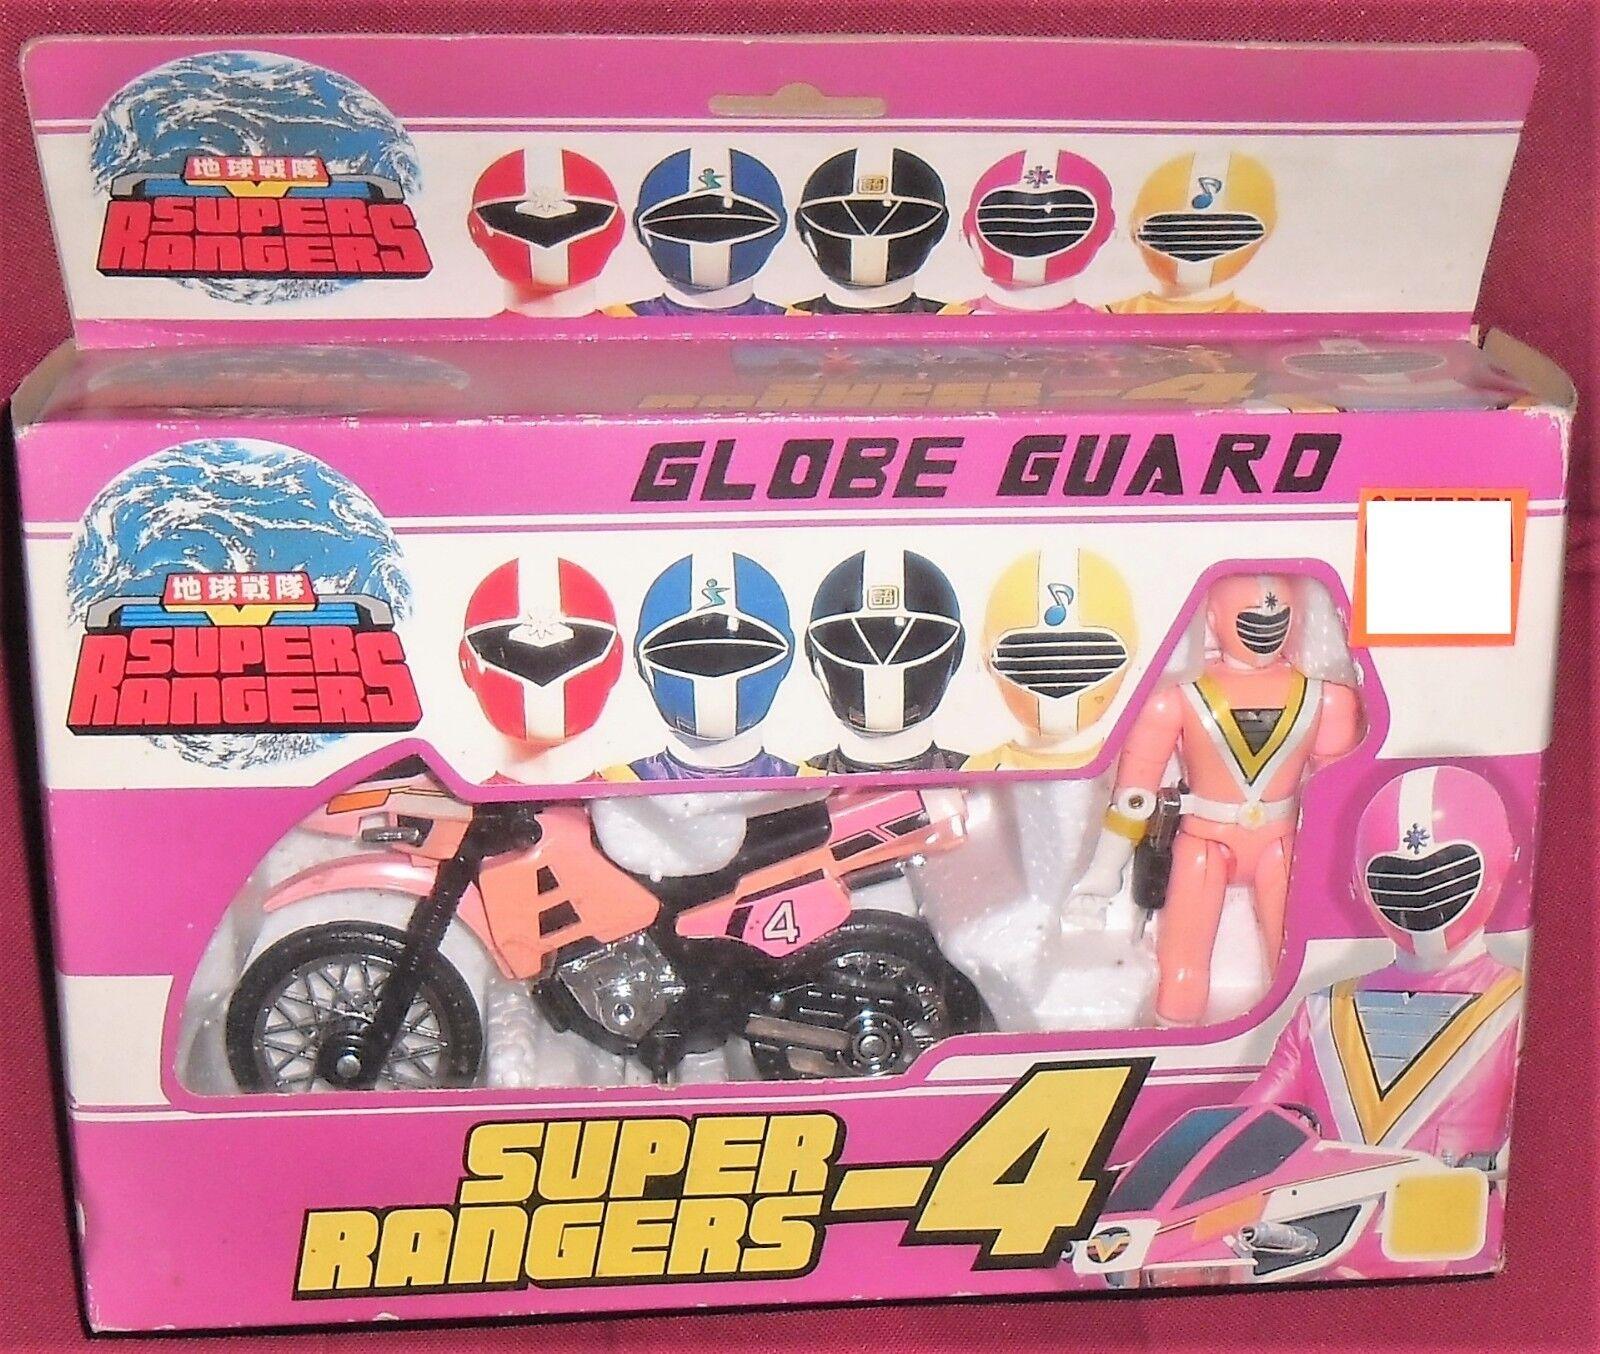 Bild hat sentai   tokusatsu fiveman taiwan 80-Rosa ranger, moto fahrrad power ranger